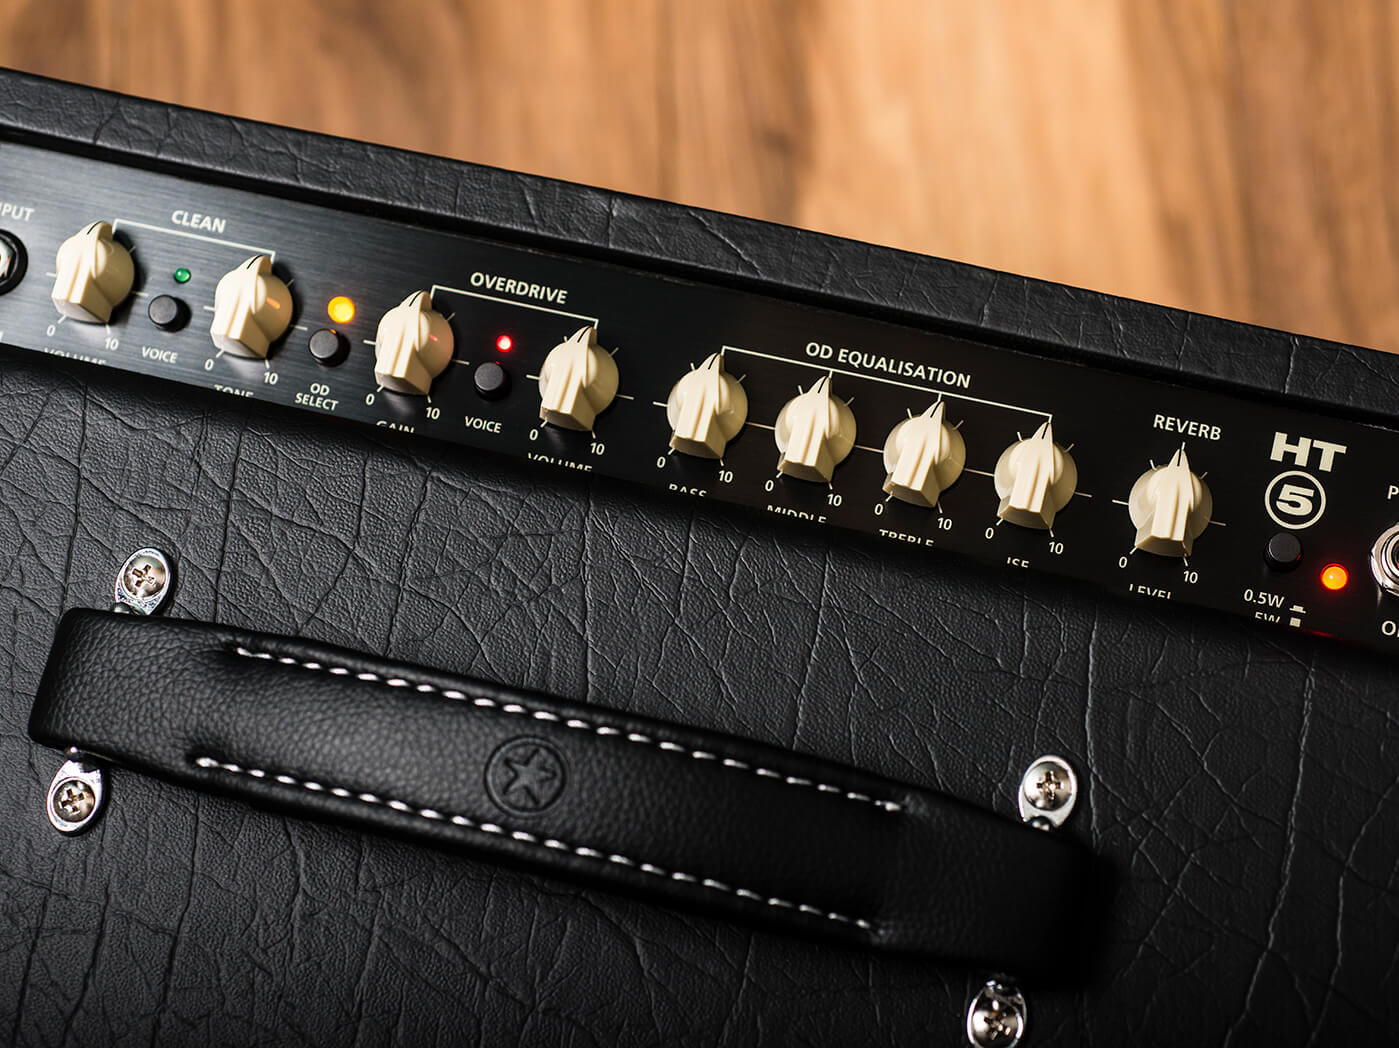 blackstar ht-5 control panel